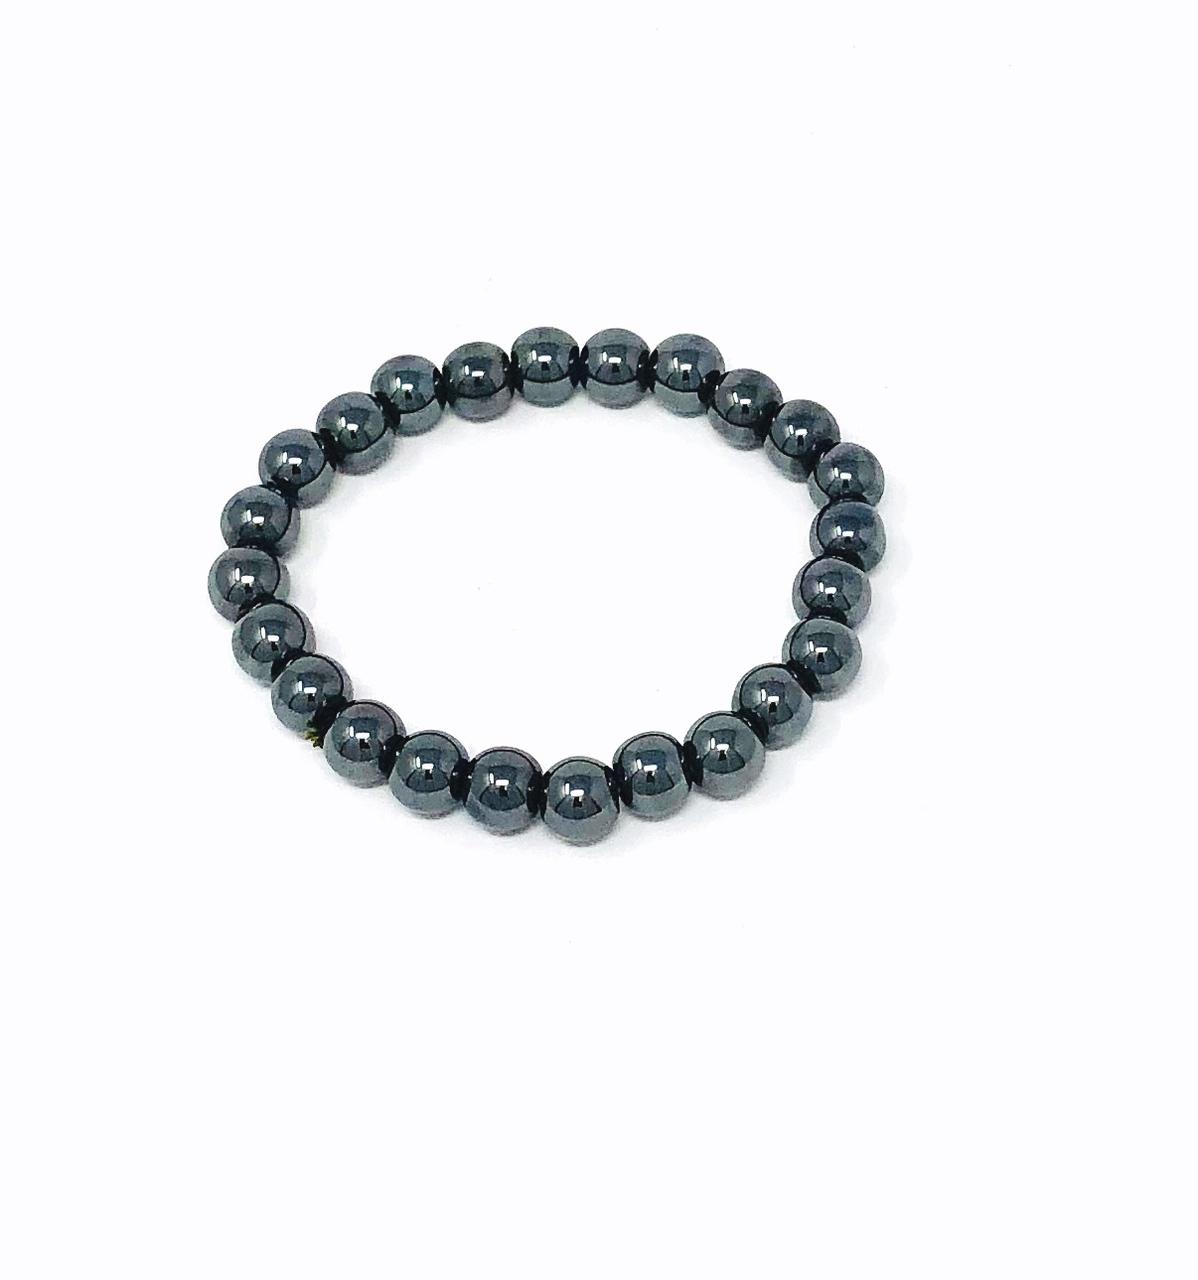 Hematite 8mm bracelet $14.99